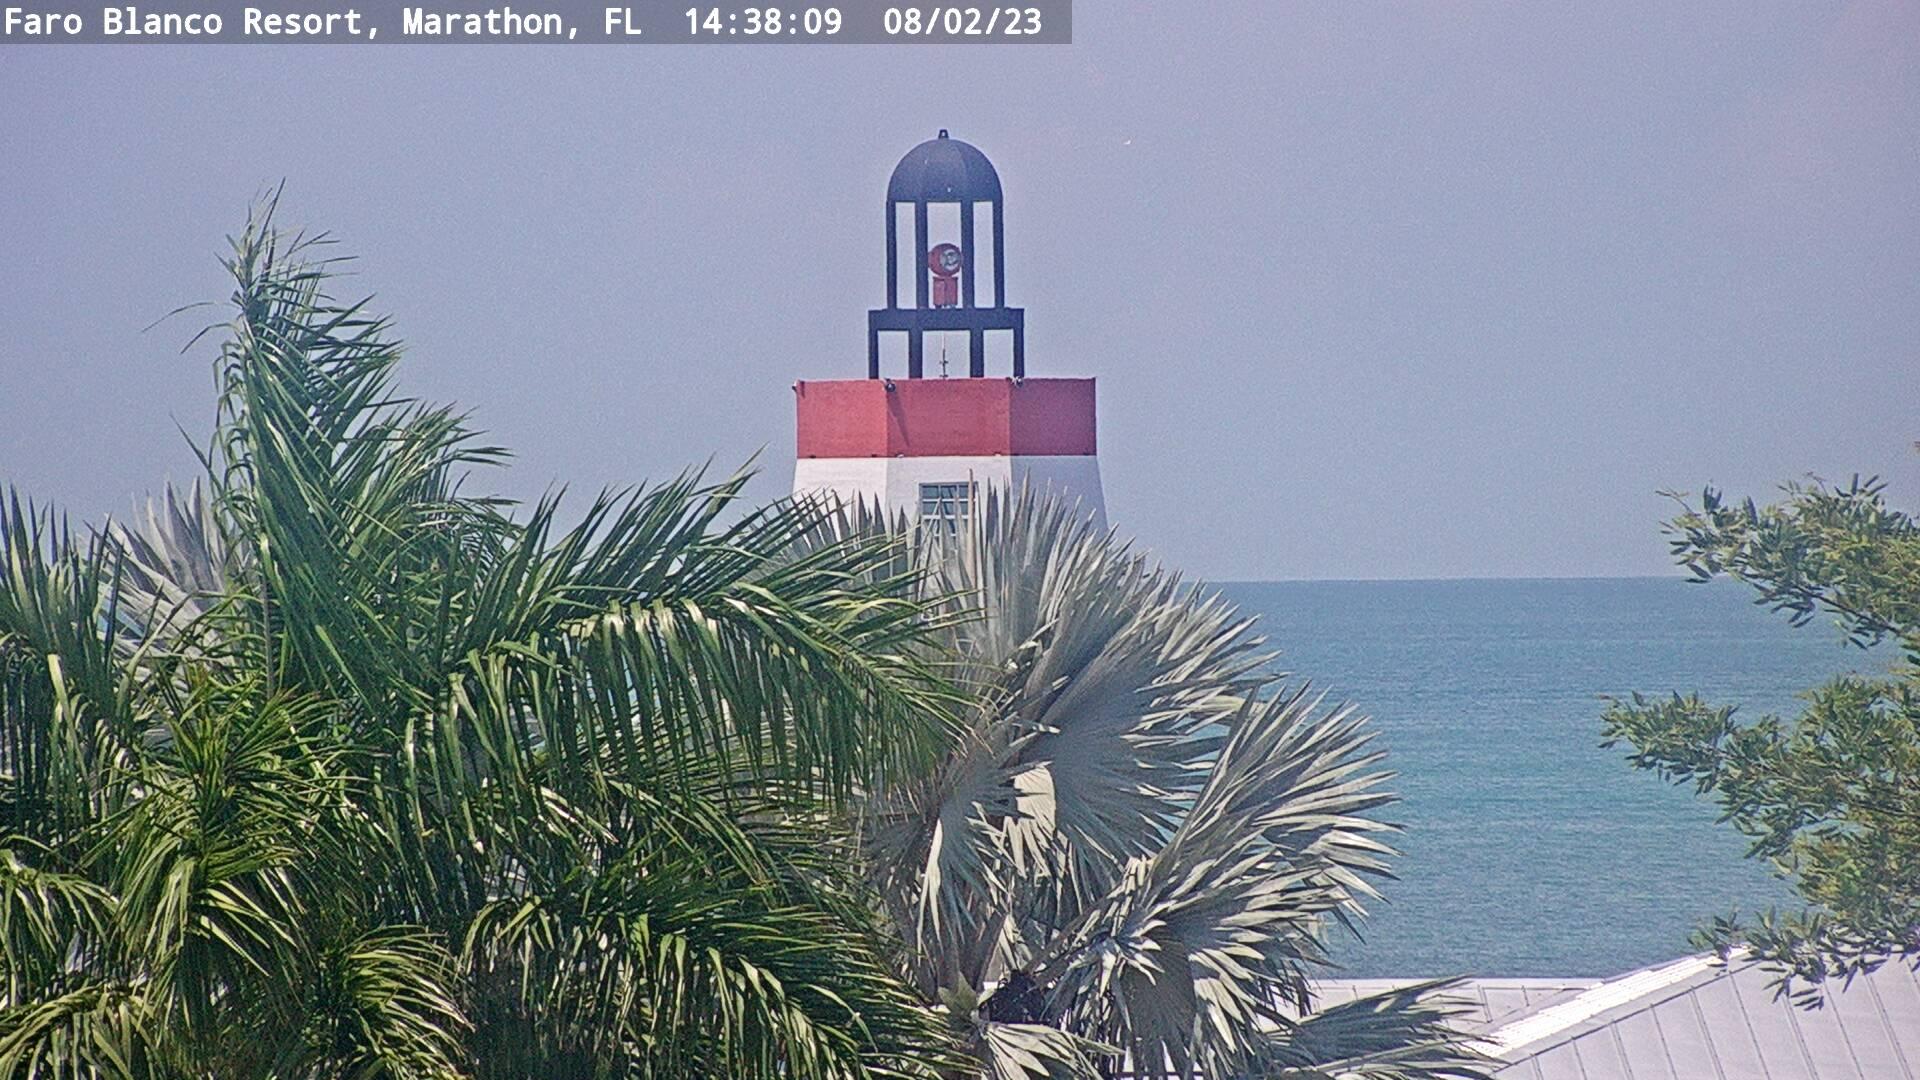 Faro Blanco Resort & Yacht Club Cam